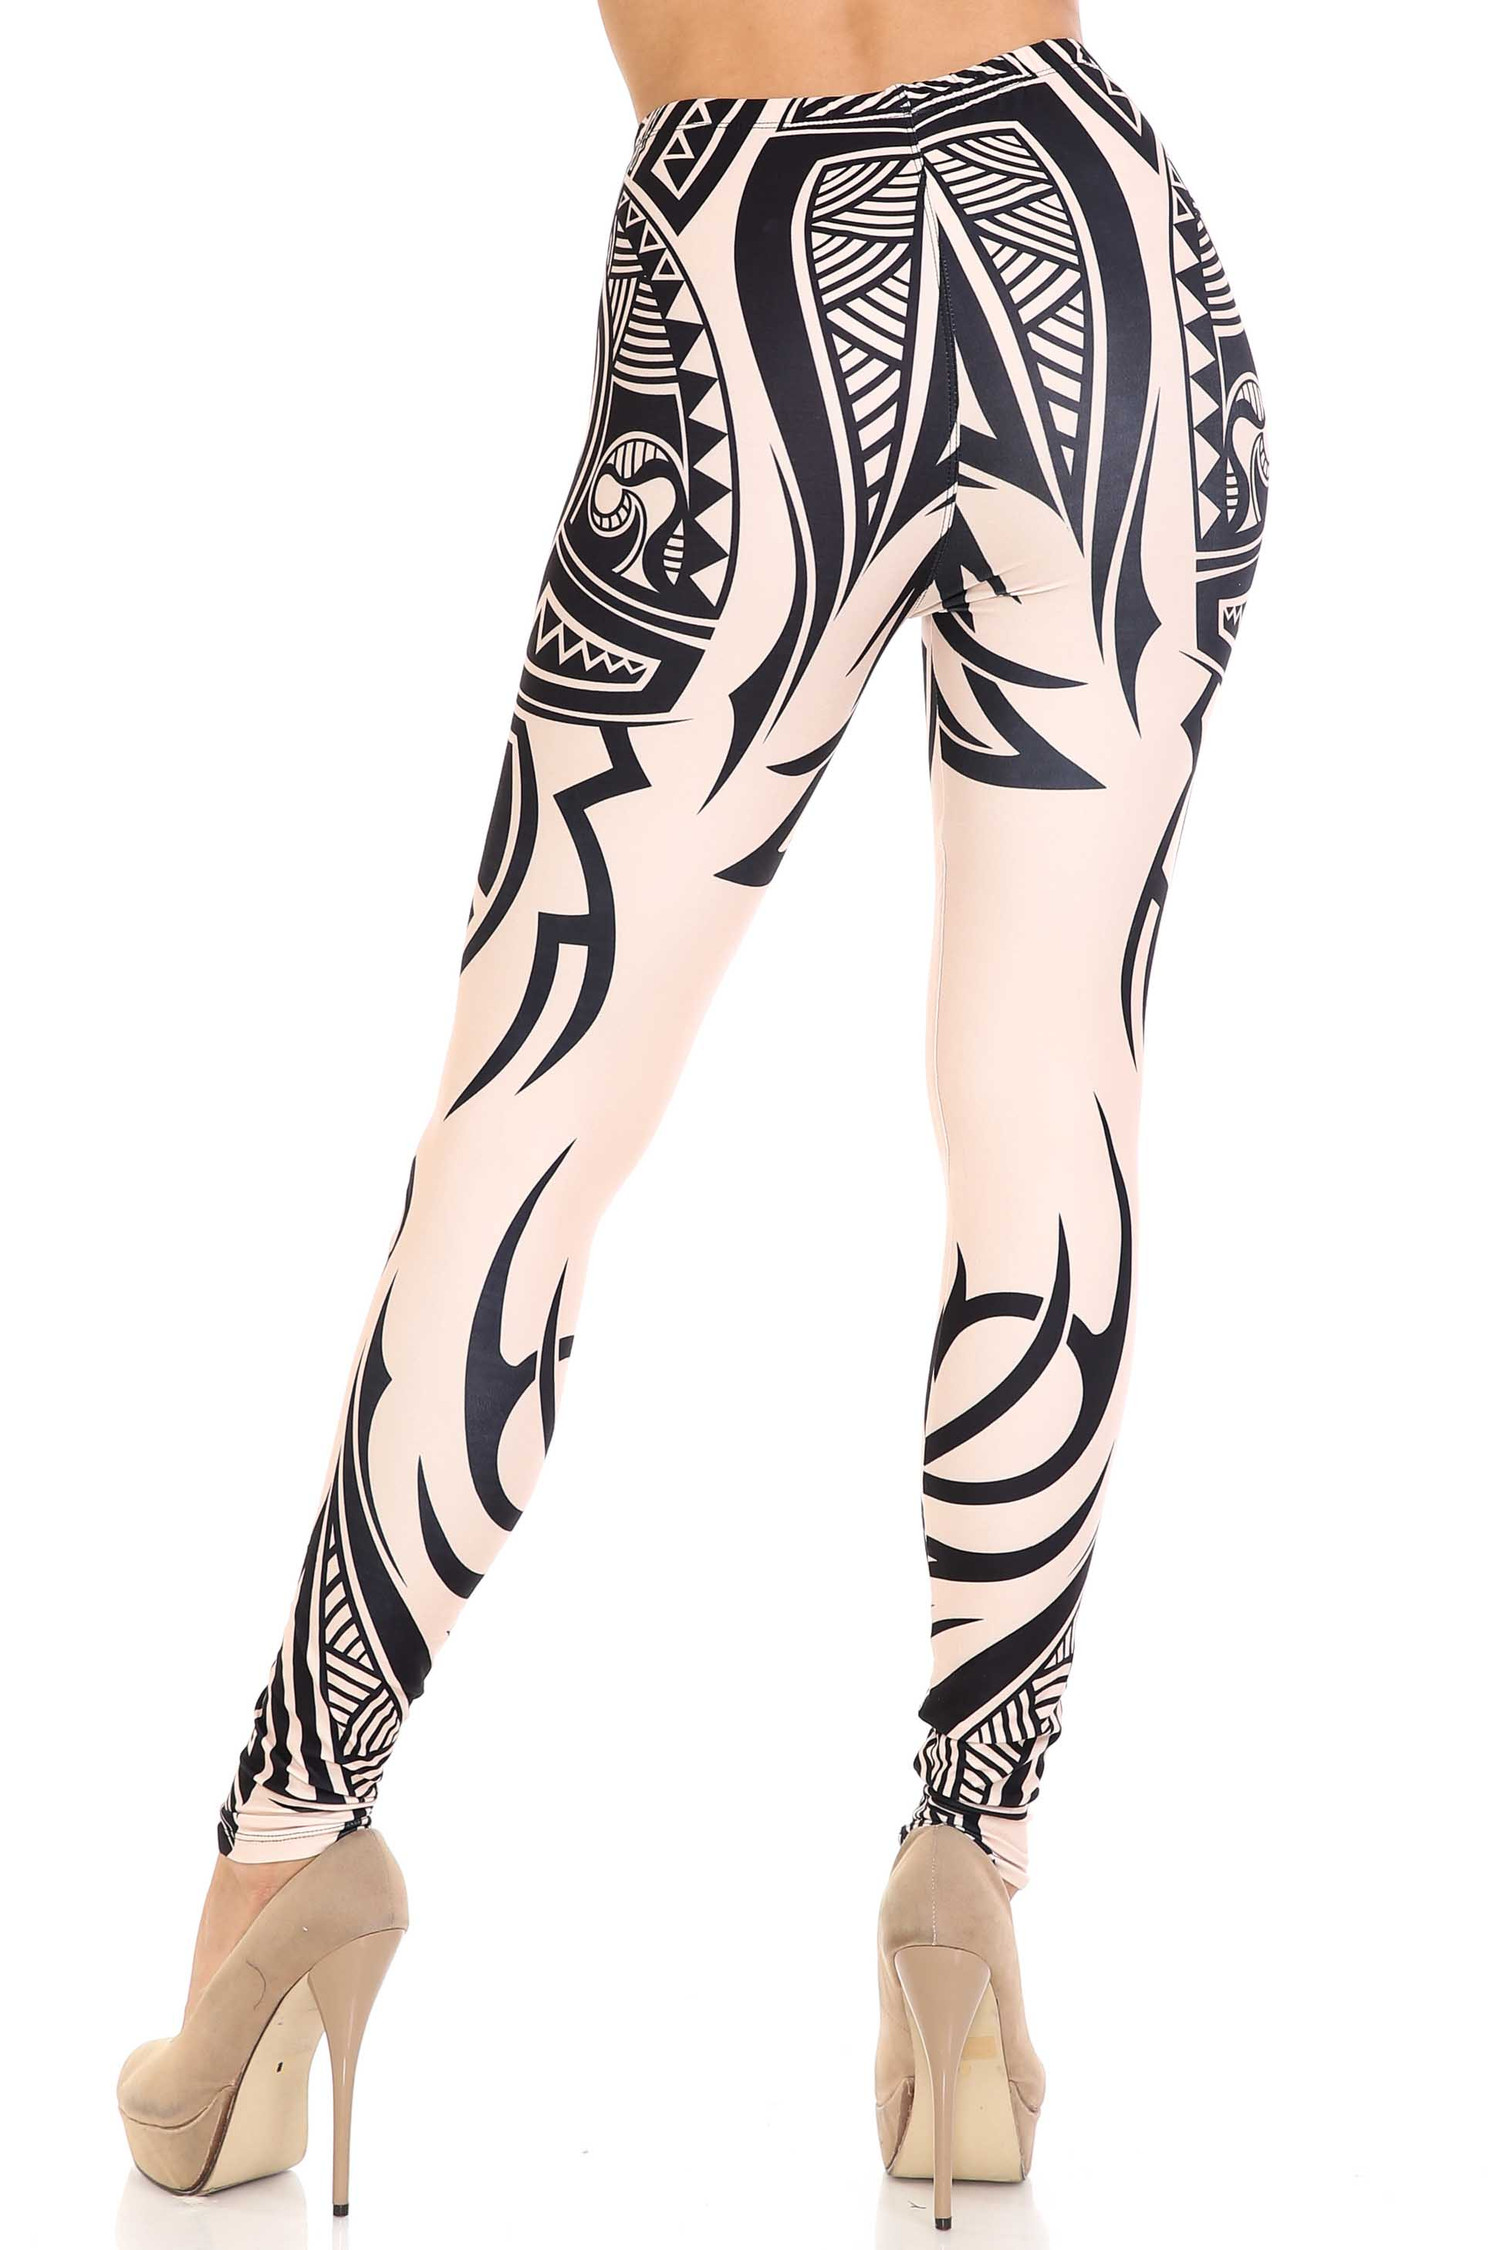 Creamy Soft Celestial Tribal Plus Size Leggings - USA Fashion™